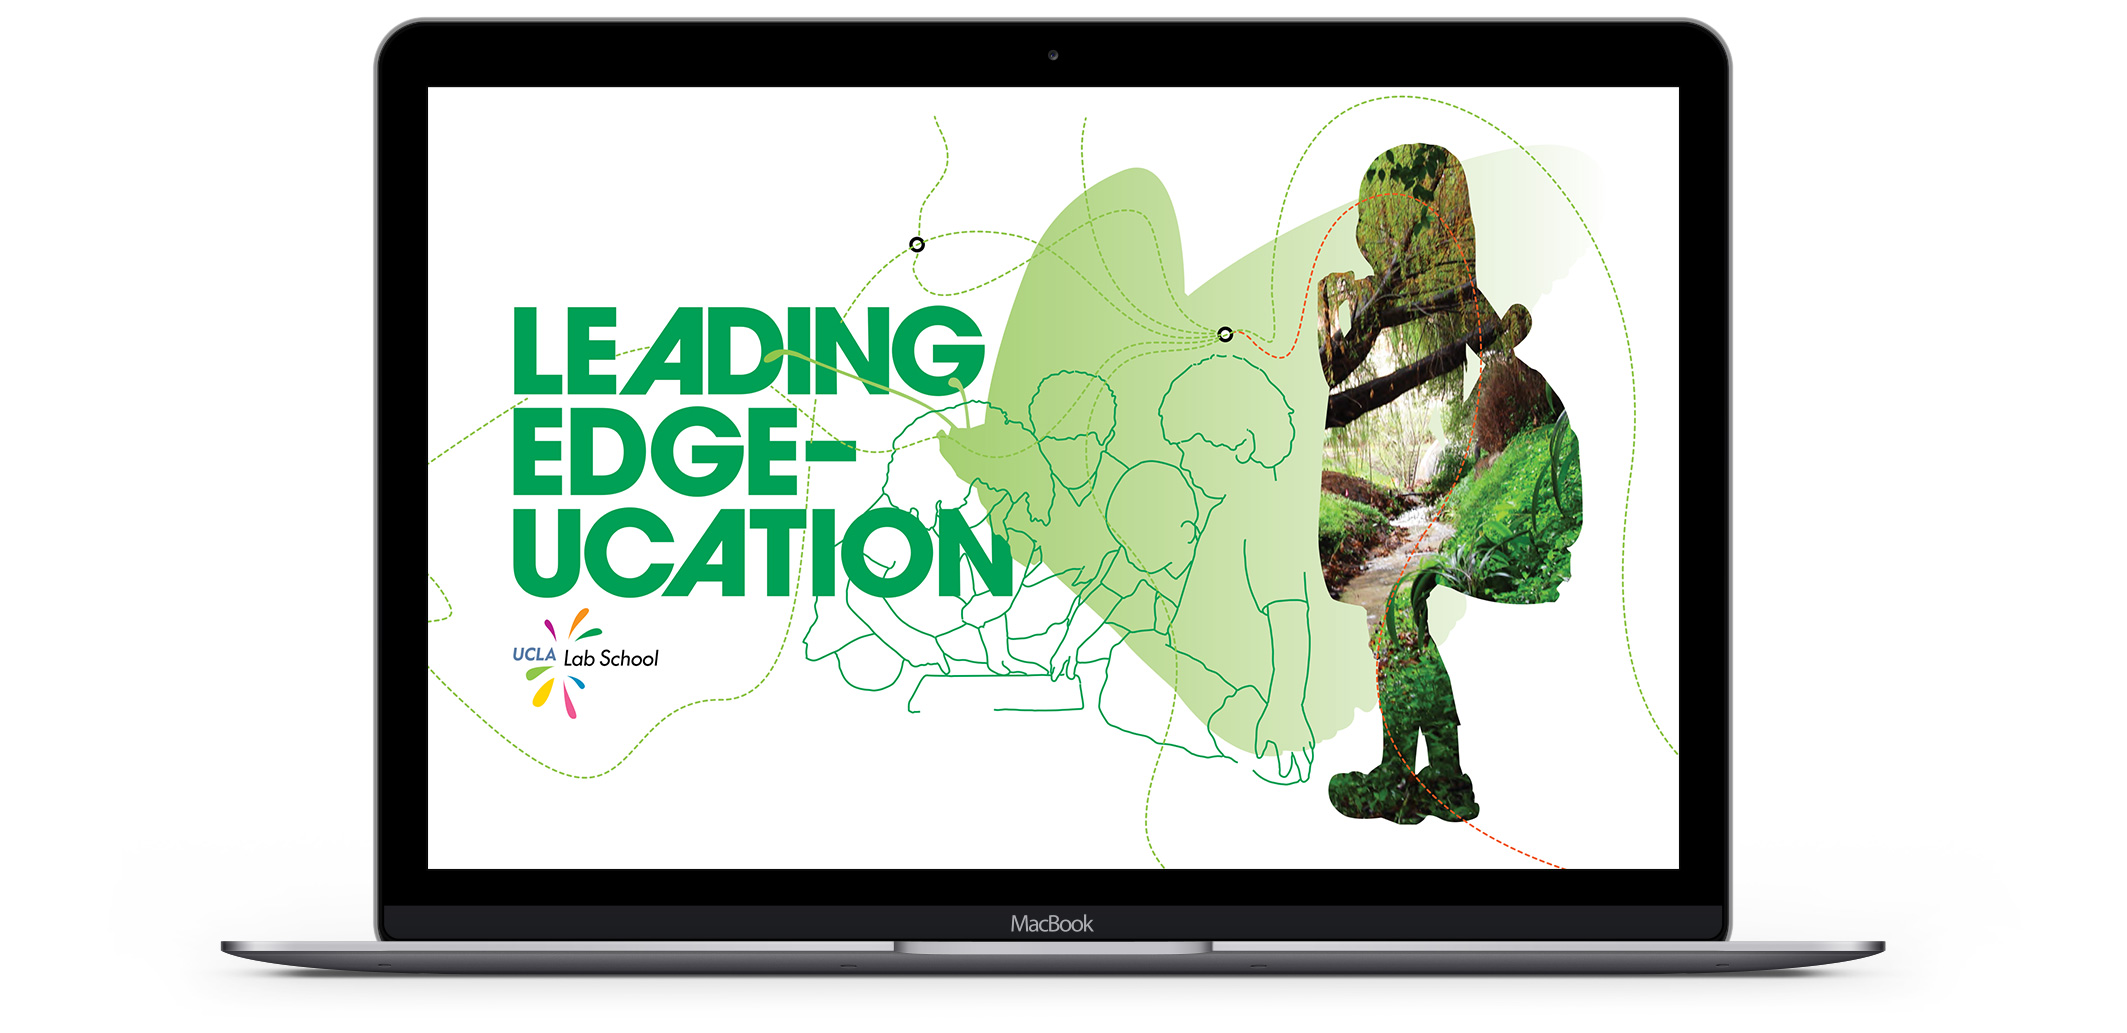 UCLA_Lab_School-Laptop-TaglineB@2x.jpg